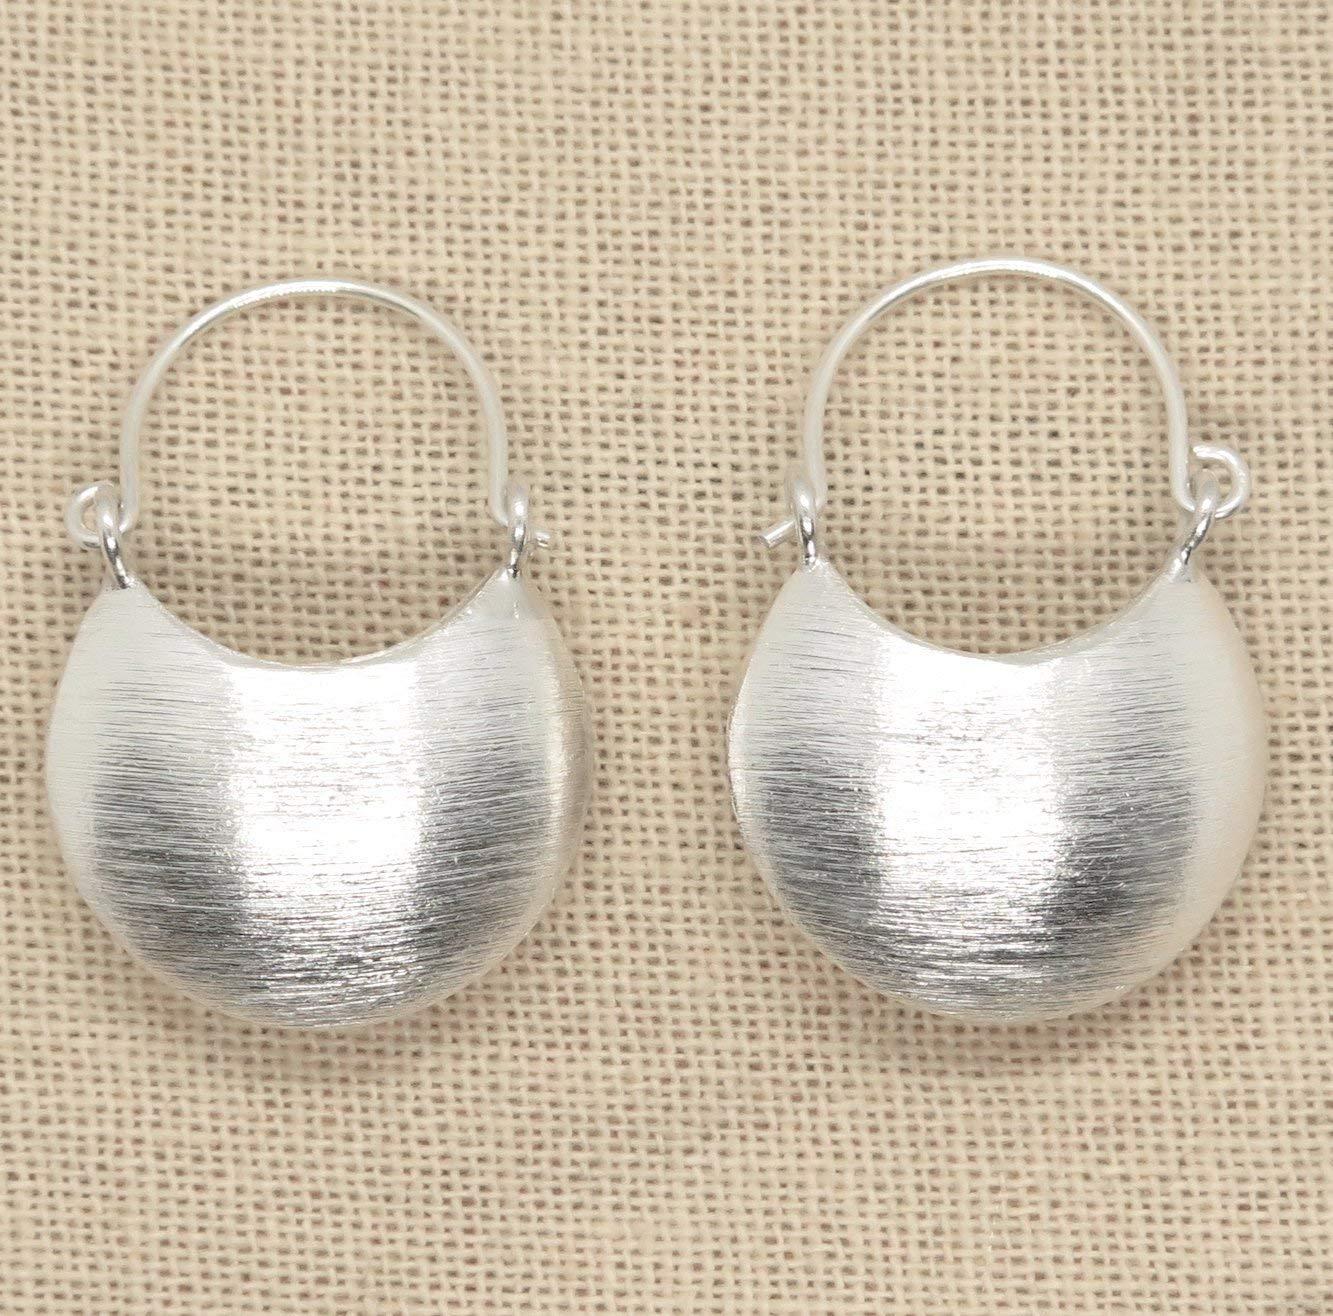 be8deea4a80e7 Cheap Silver Half Moon Earrings, find Silver Half Moon Earrings ...